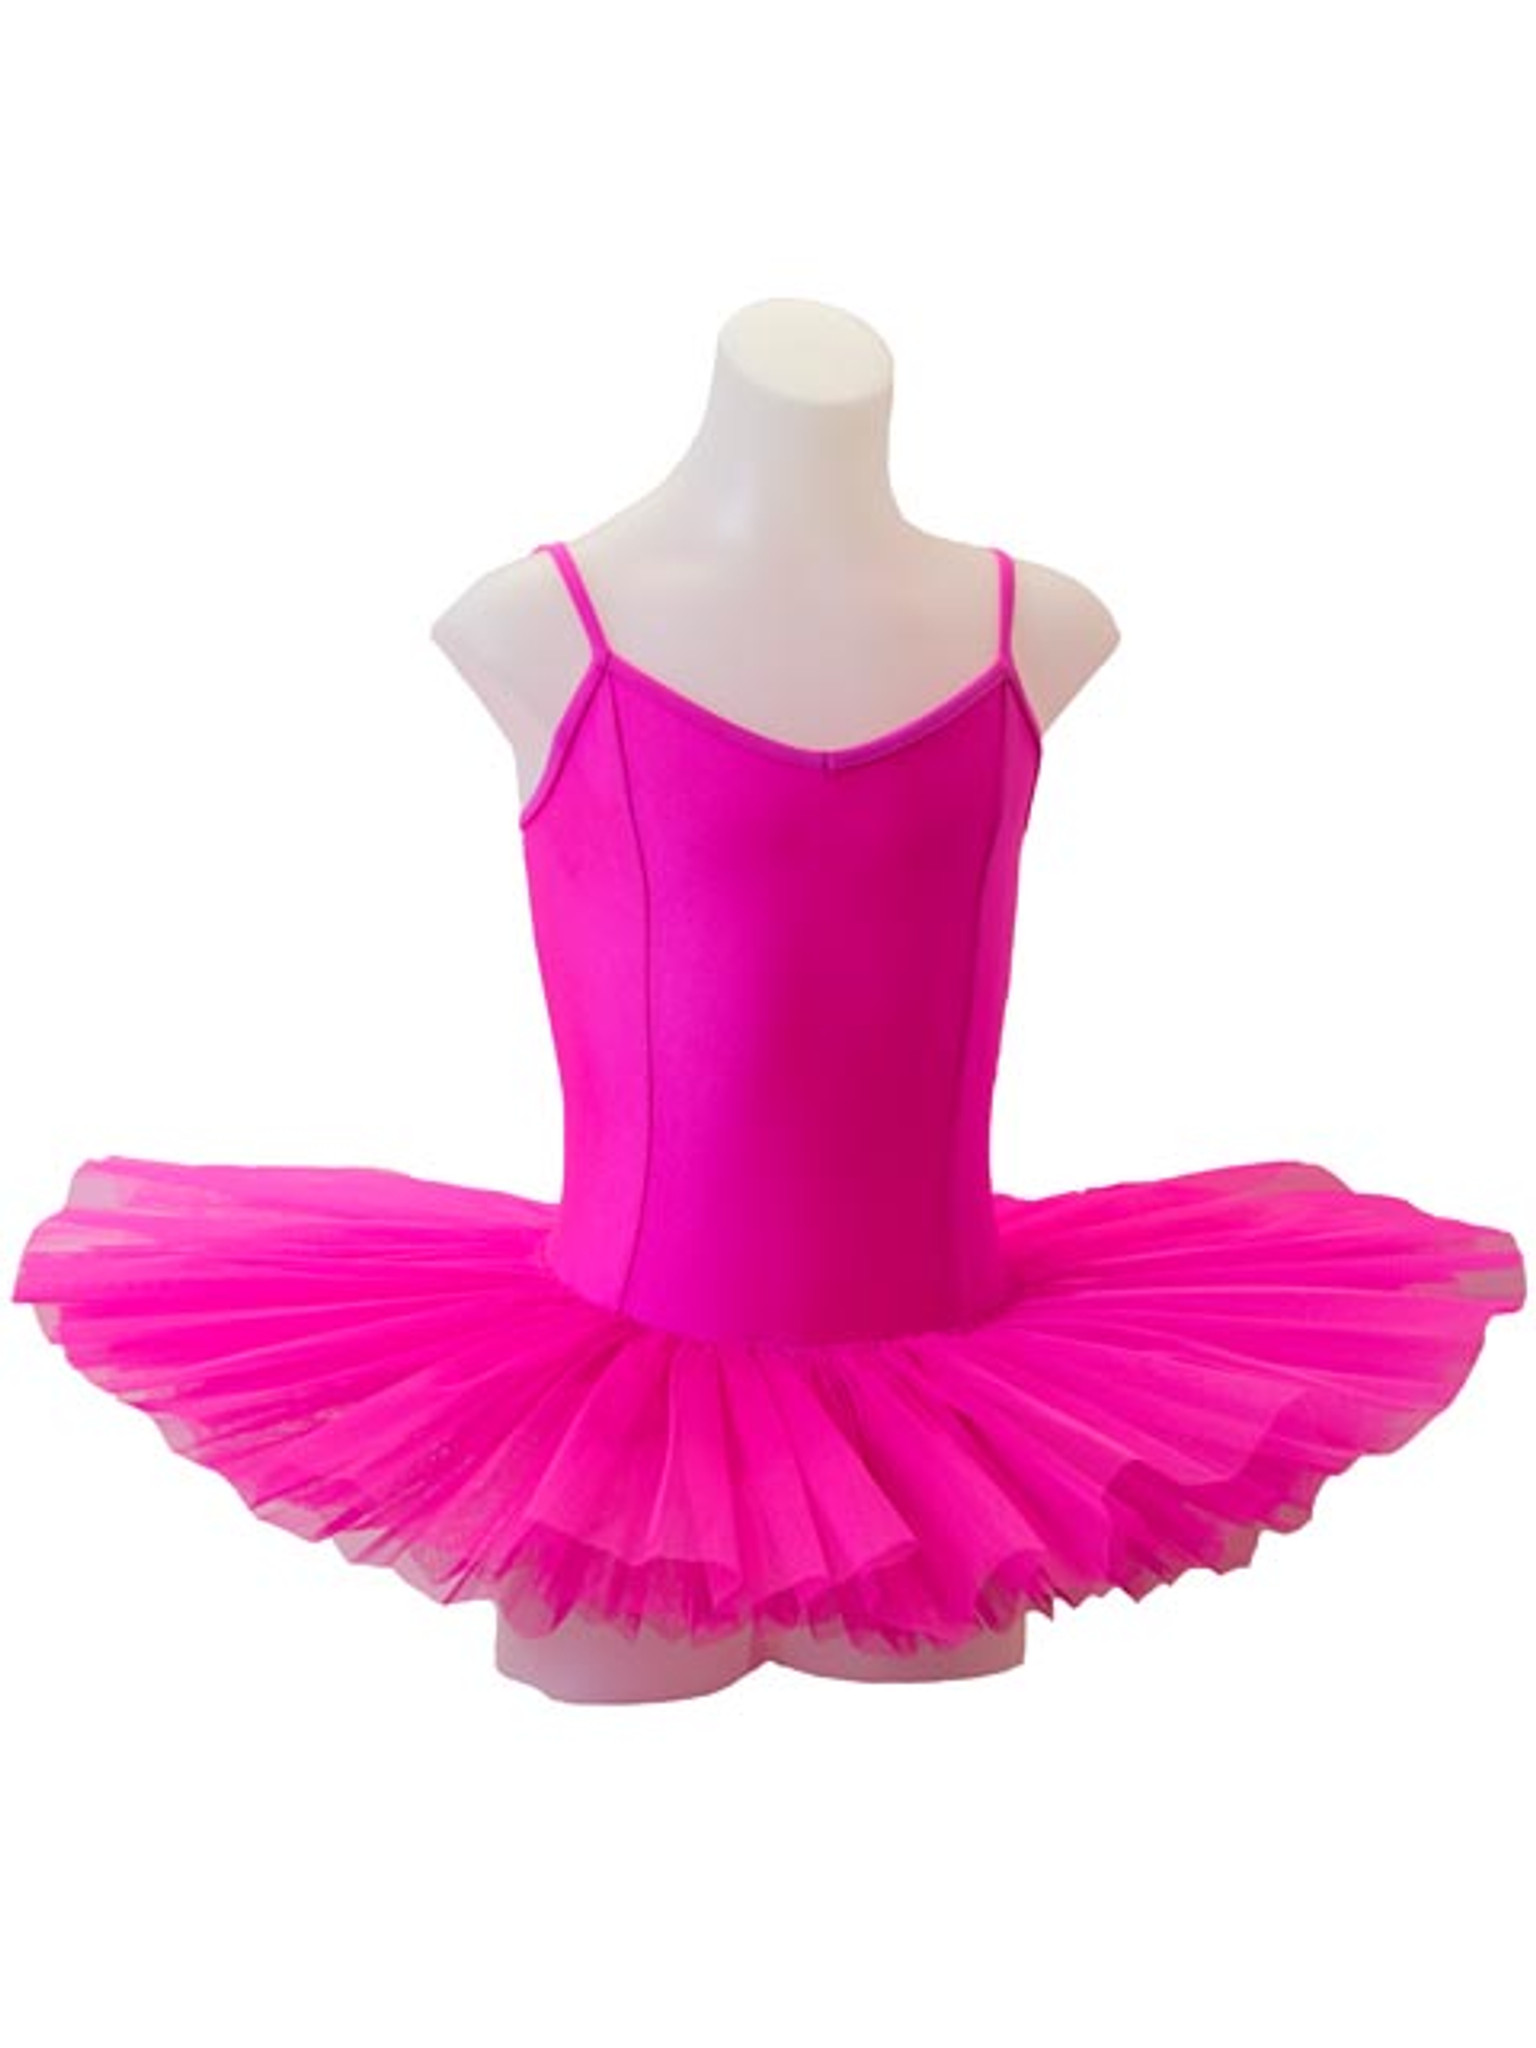 STUDIO 7 DANCEWEAR Tutu Dresses